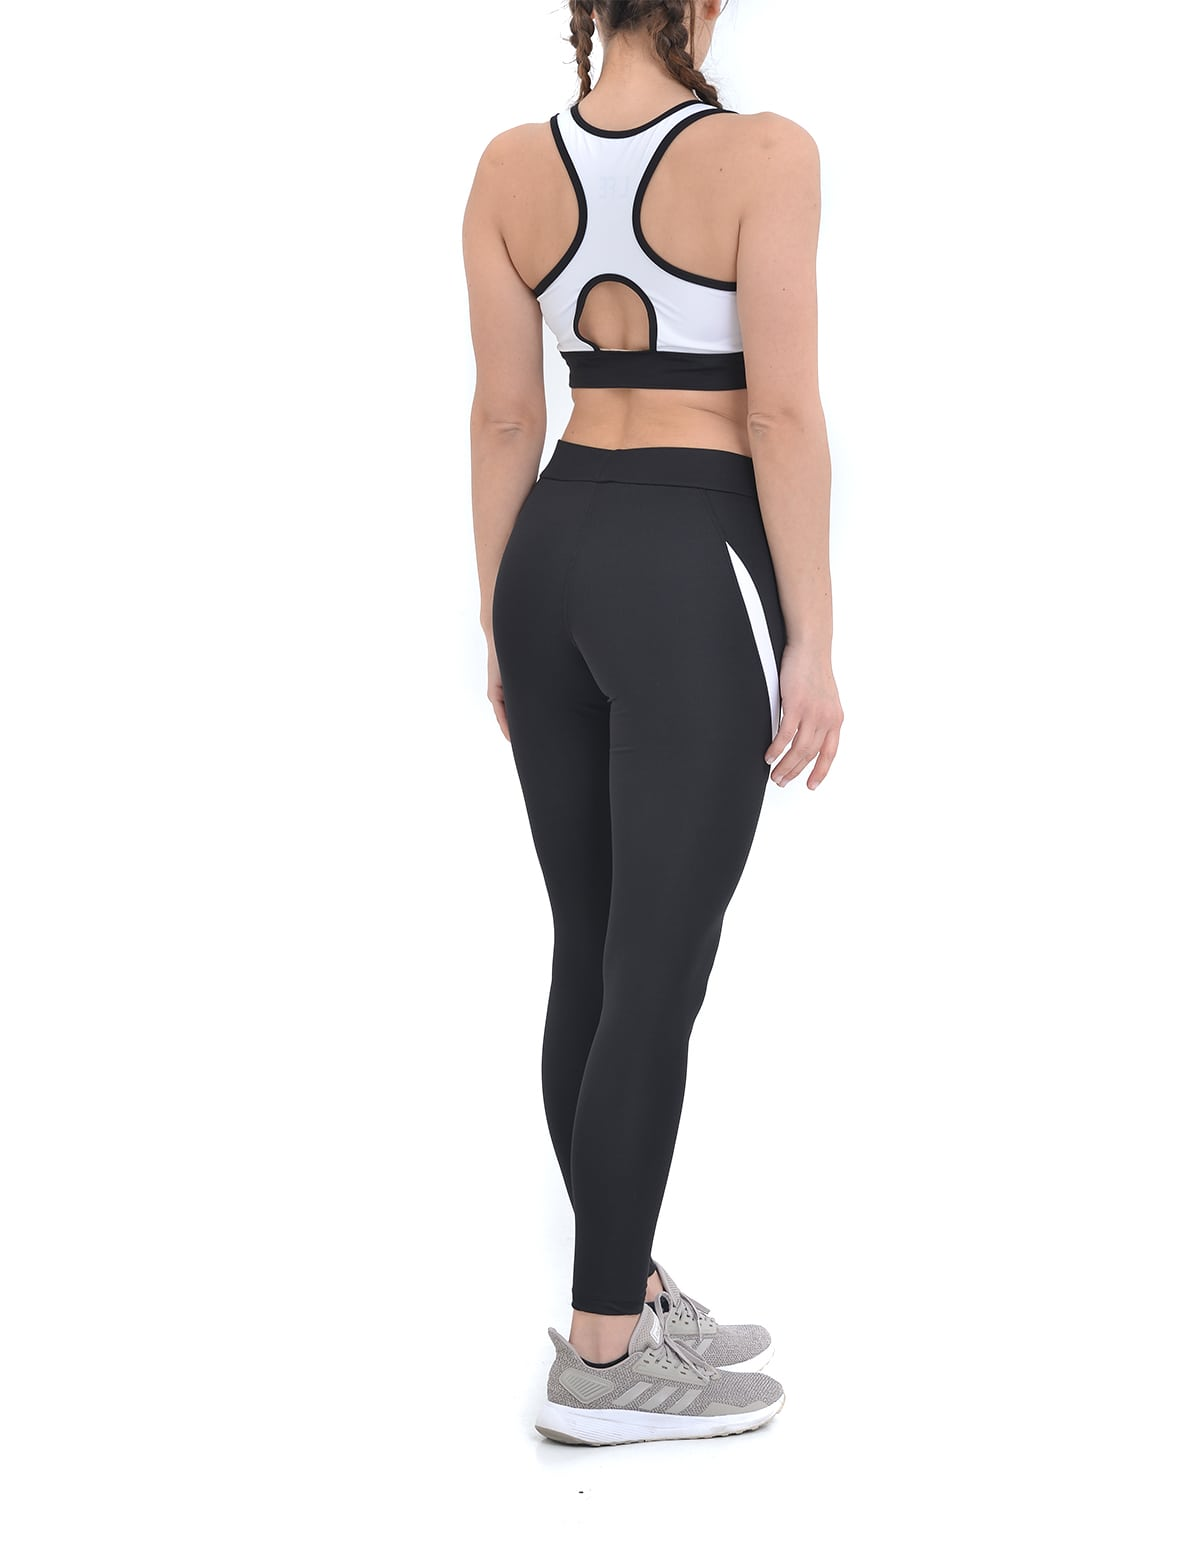 8f0a9e83d3f3 Home Γυναικεία Σετ κολάν Αθλητικό σετ μπουστάκι και κολάν σε μαύρο-λευκό  χρώμα